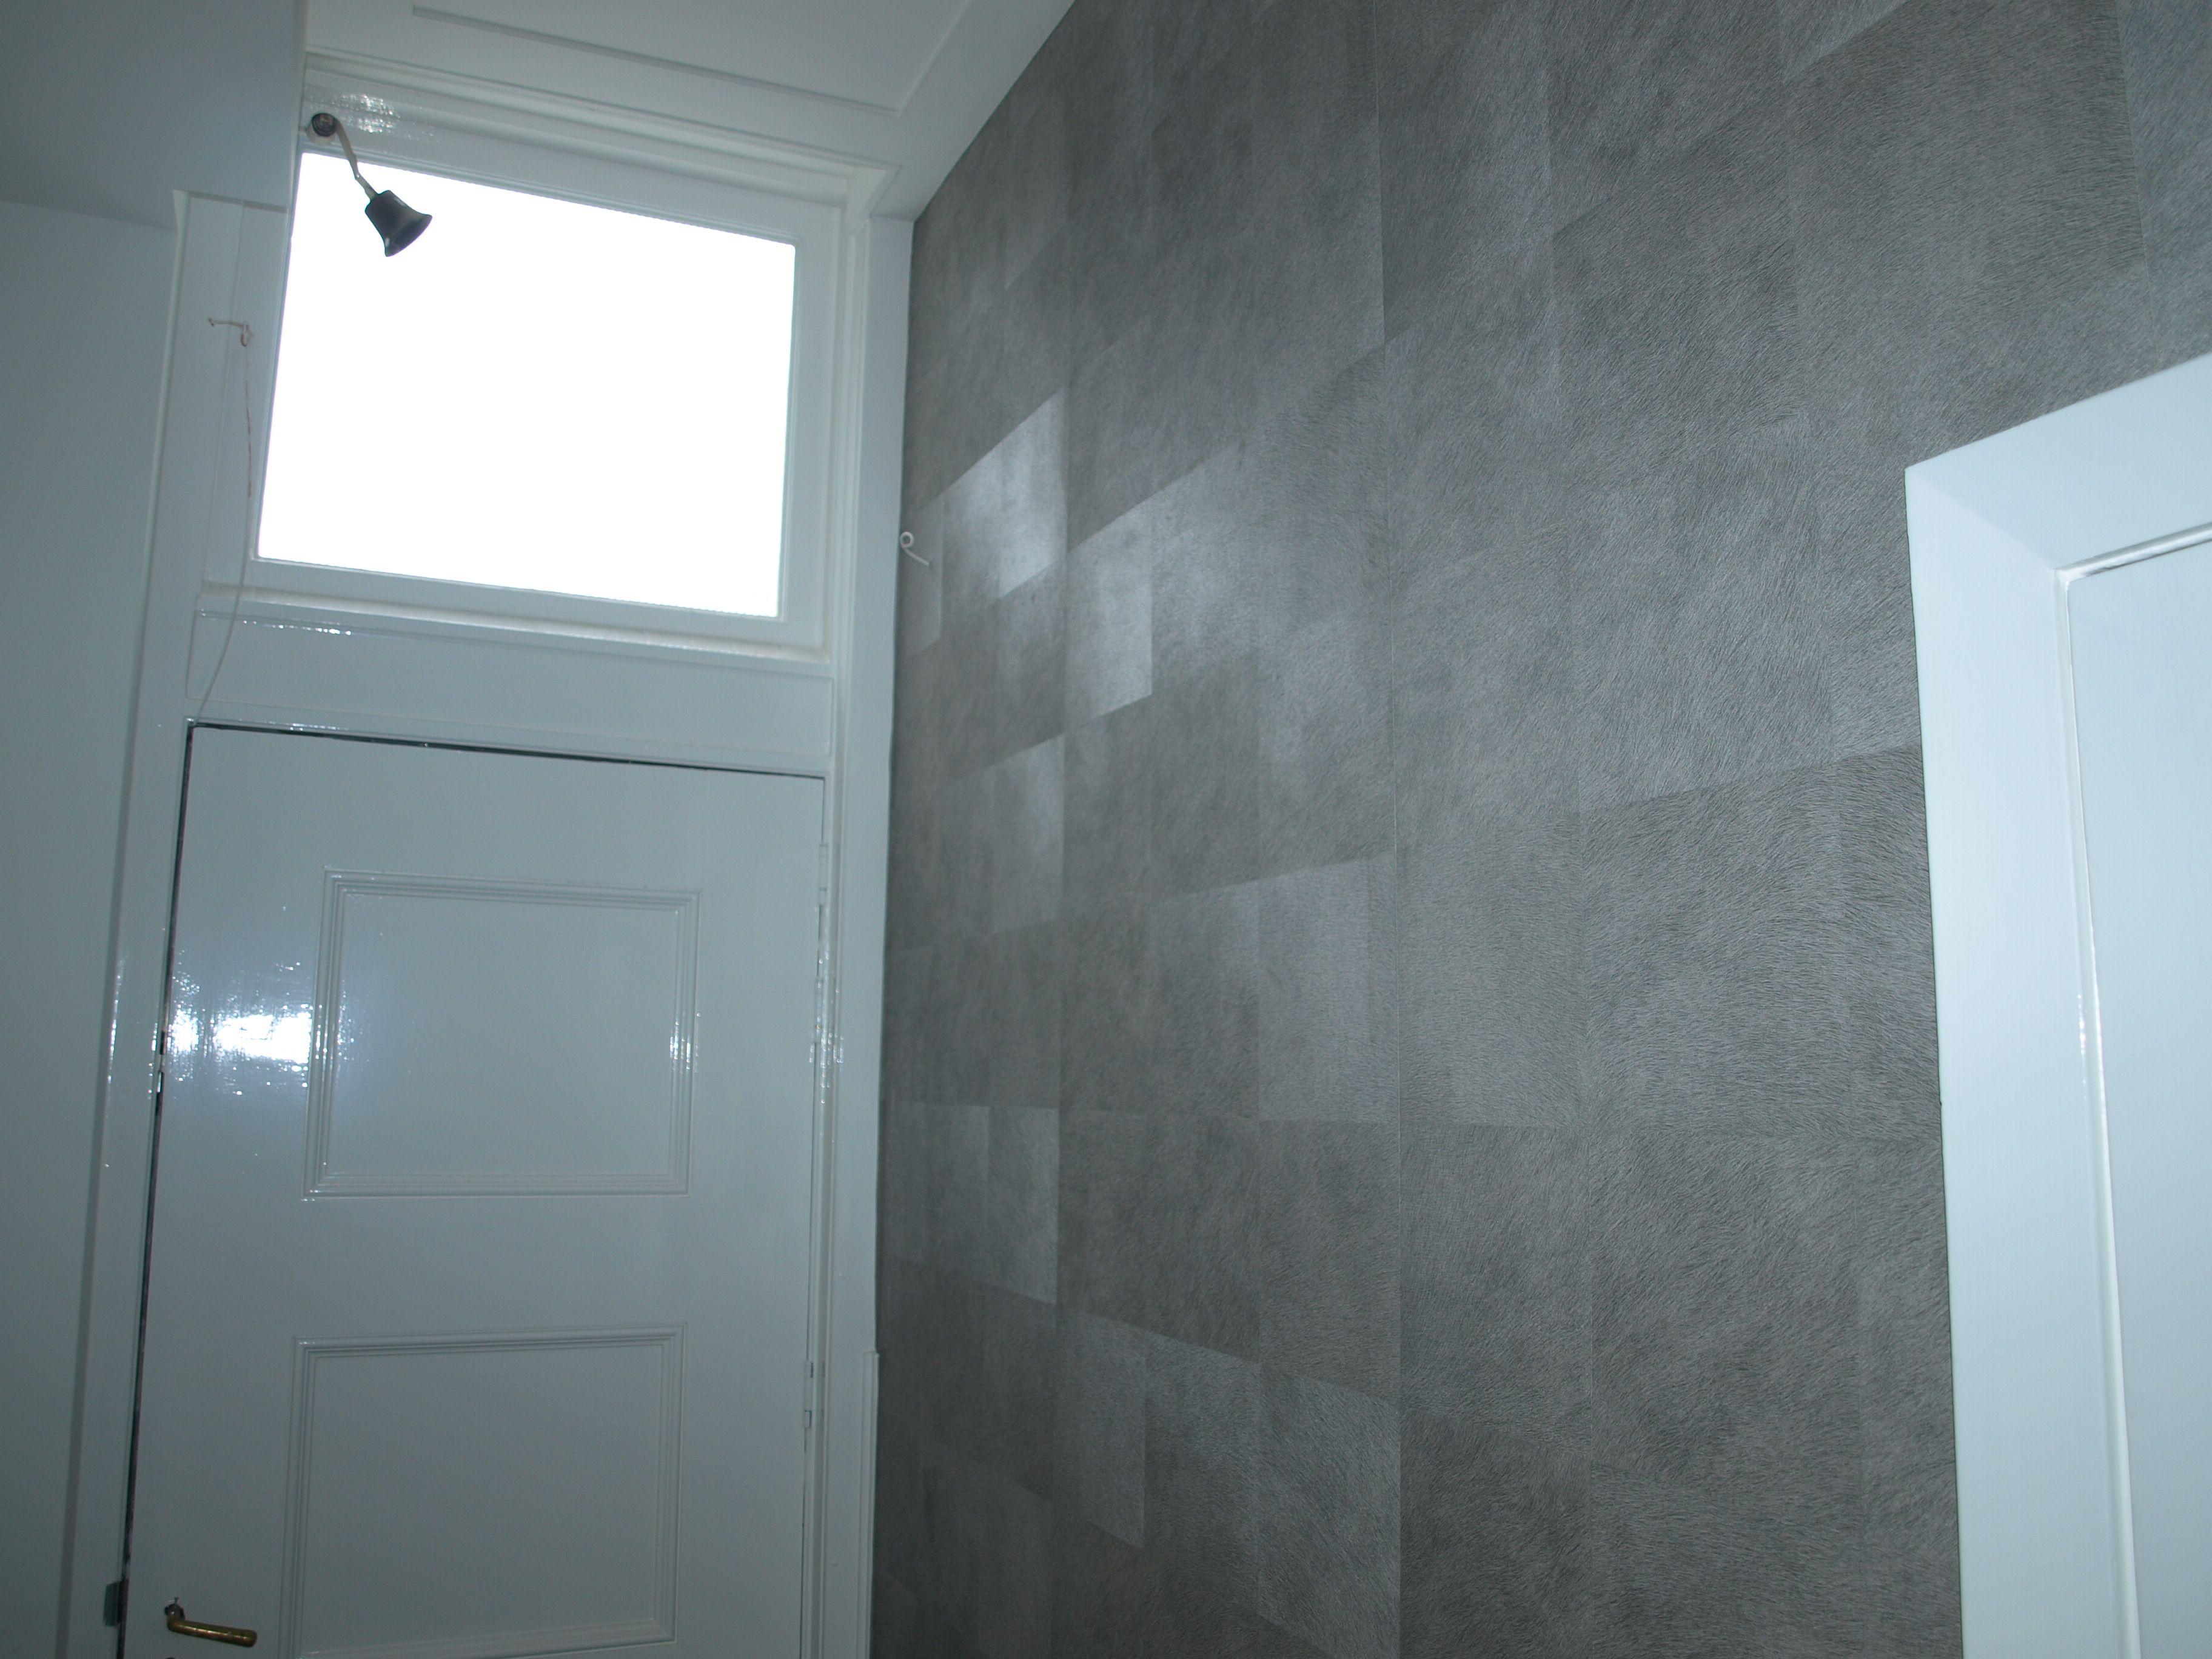 Gang voorzien van elitis behang slaapkamer pinterest - Behang ingang gang ...